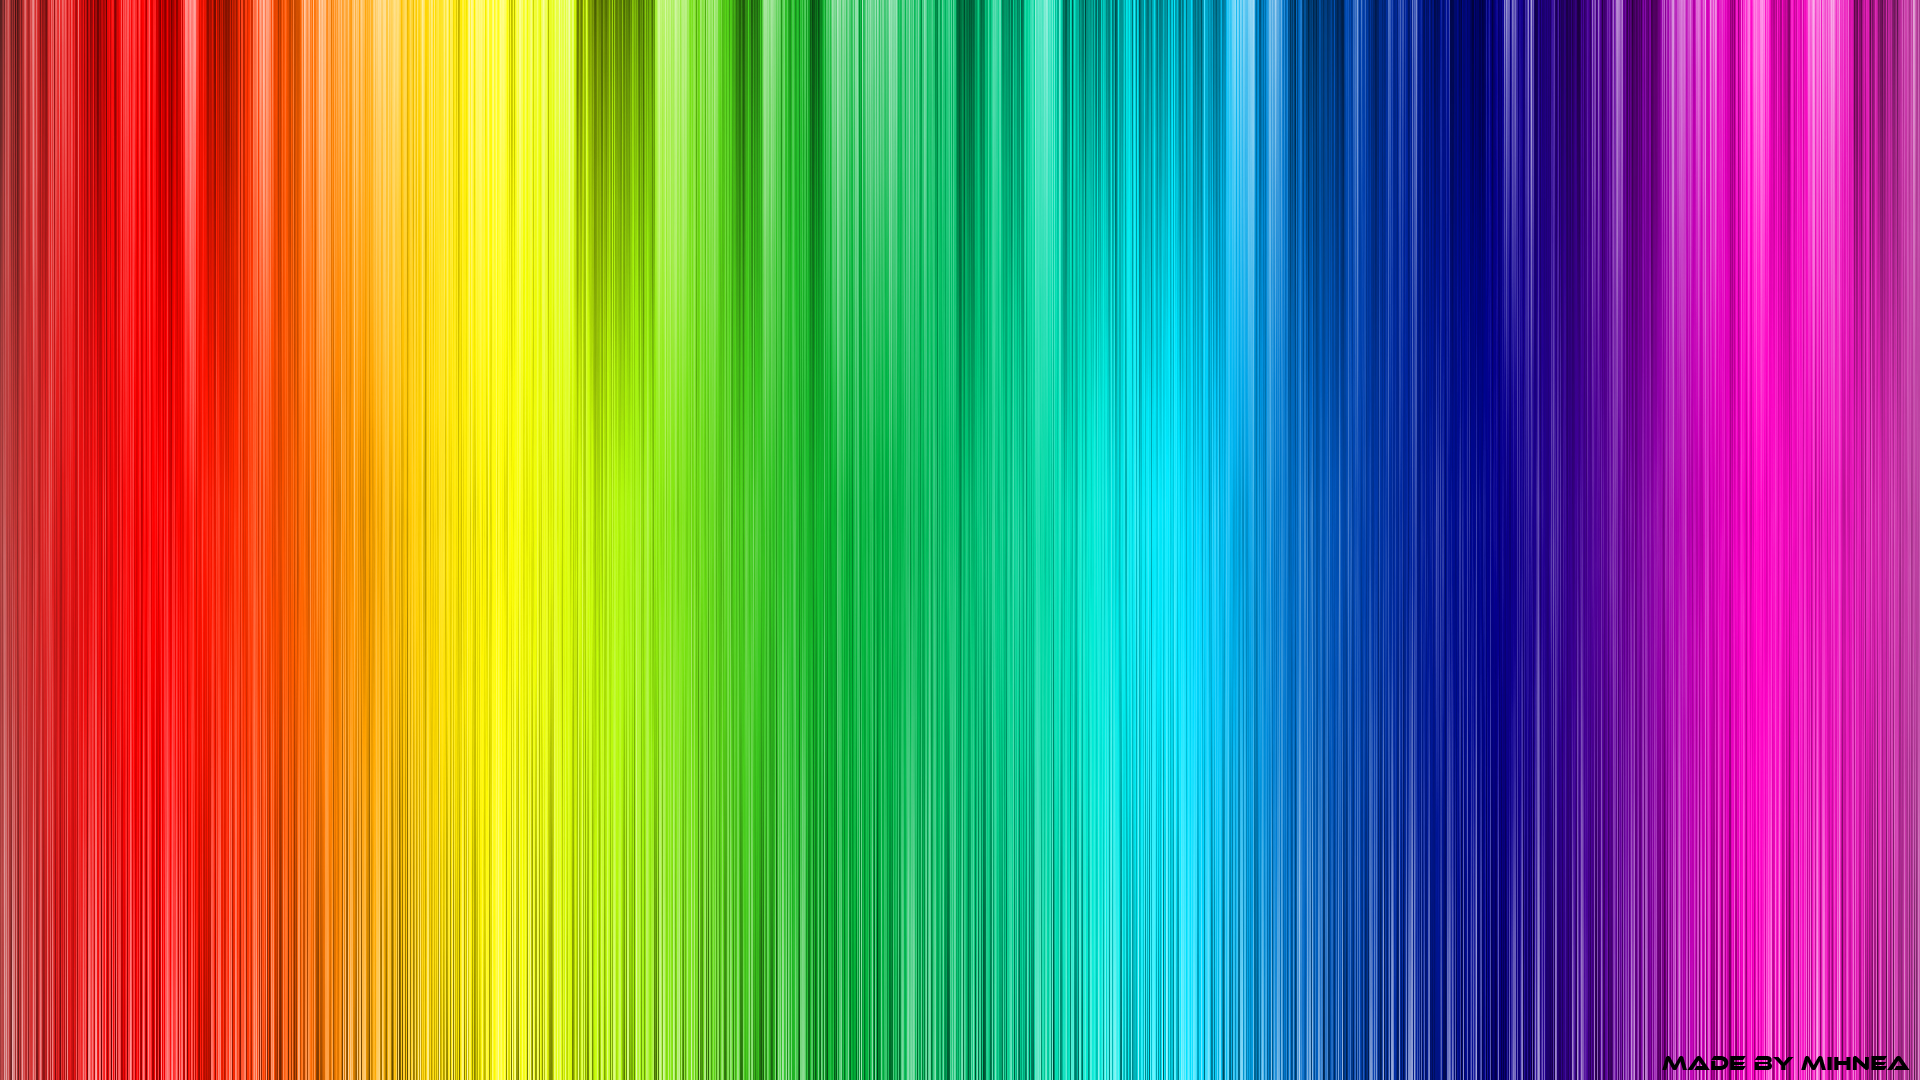 Cool Multicolor Wallpaper 31813 2560x1600 px